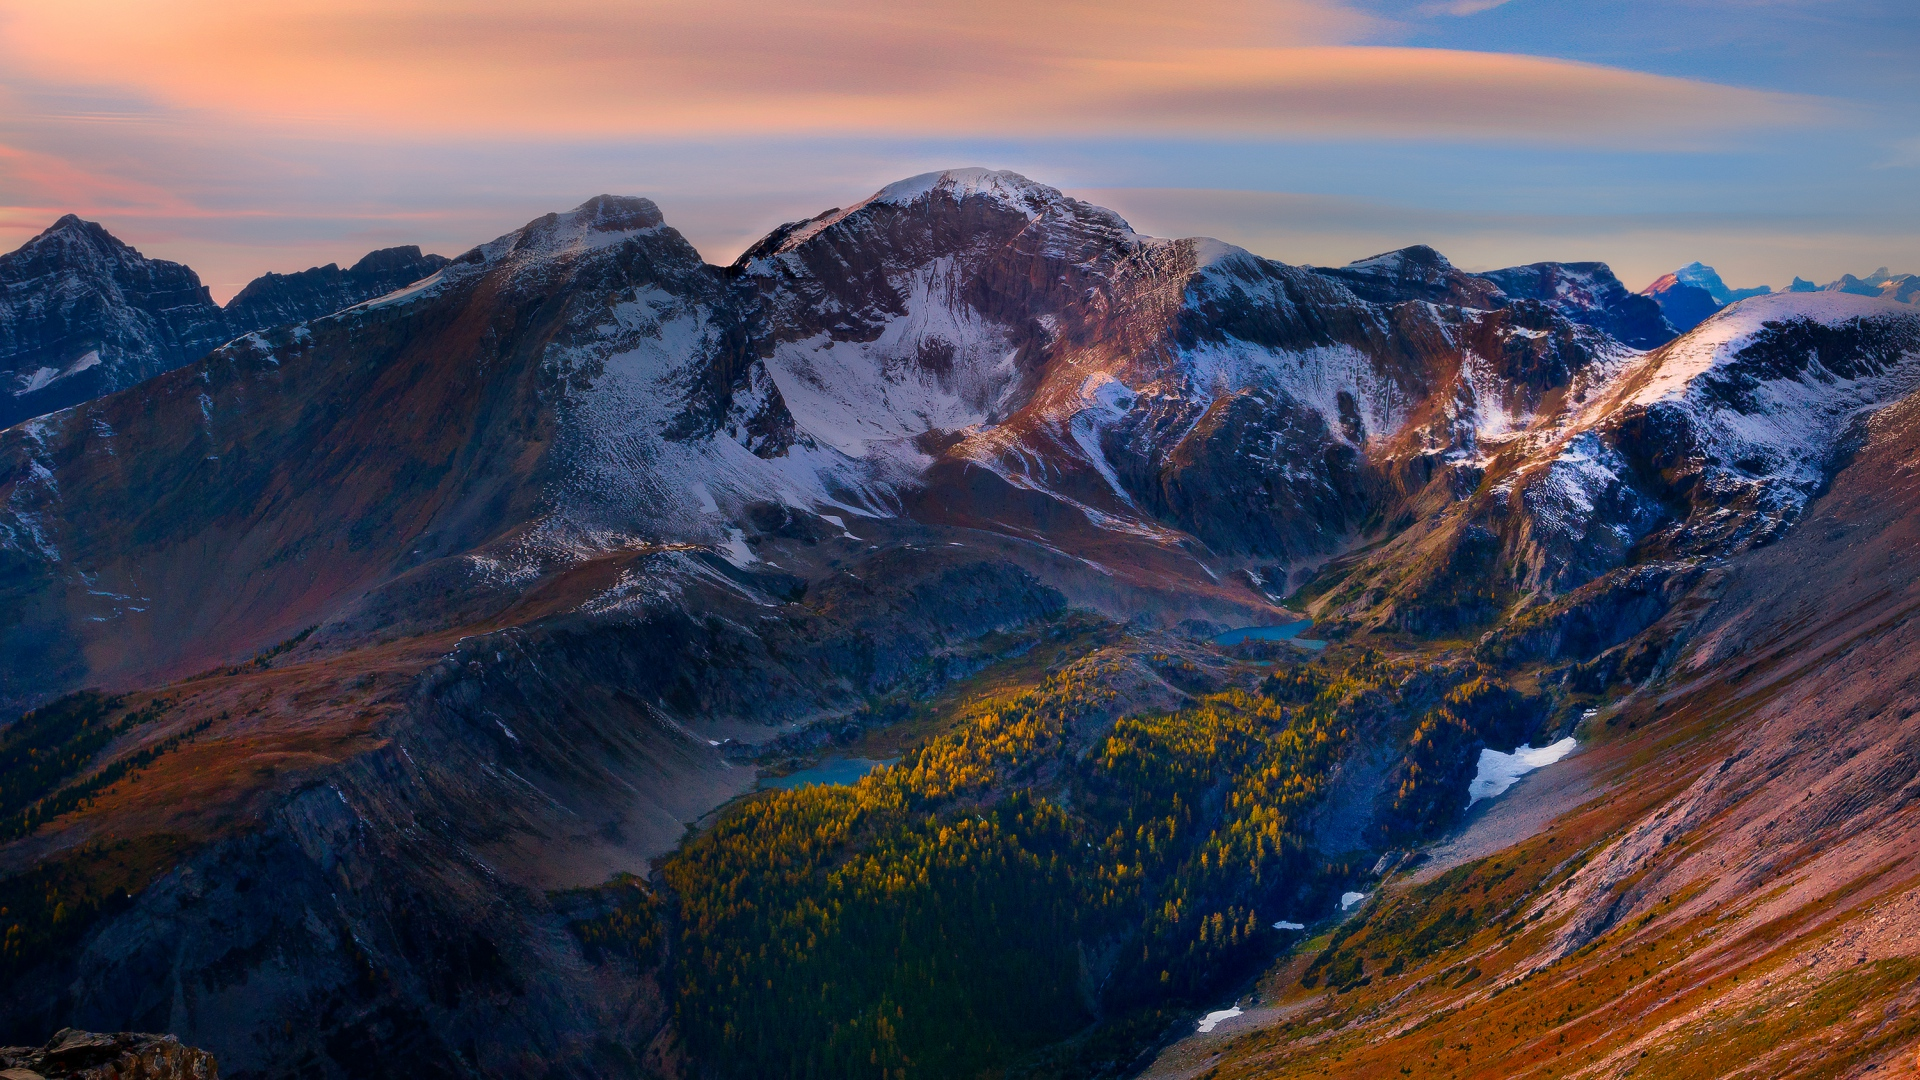 1080P HD Mountain Wallpaper WallpaperSafari